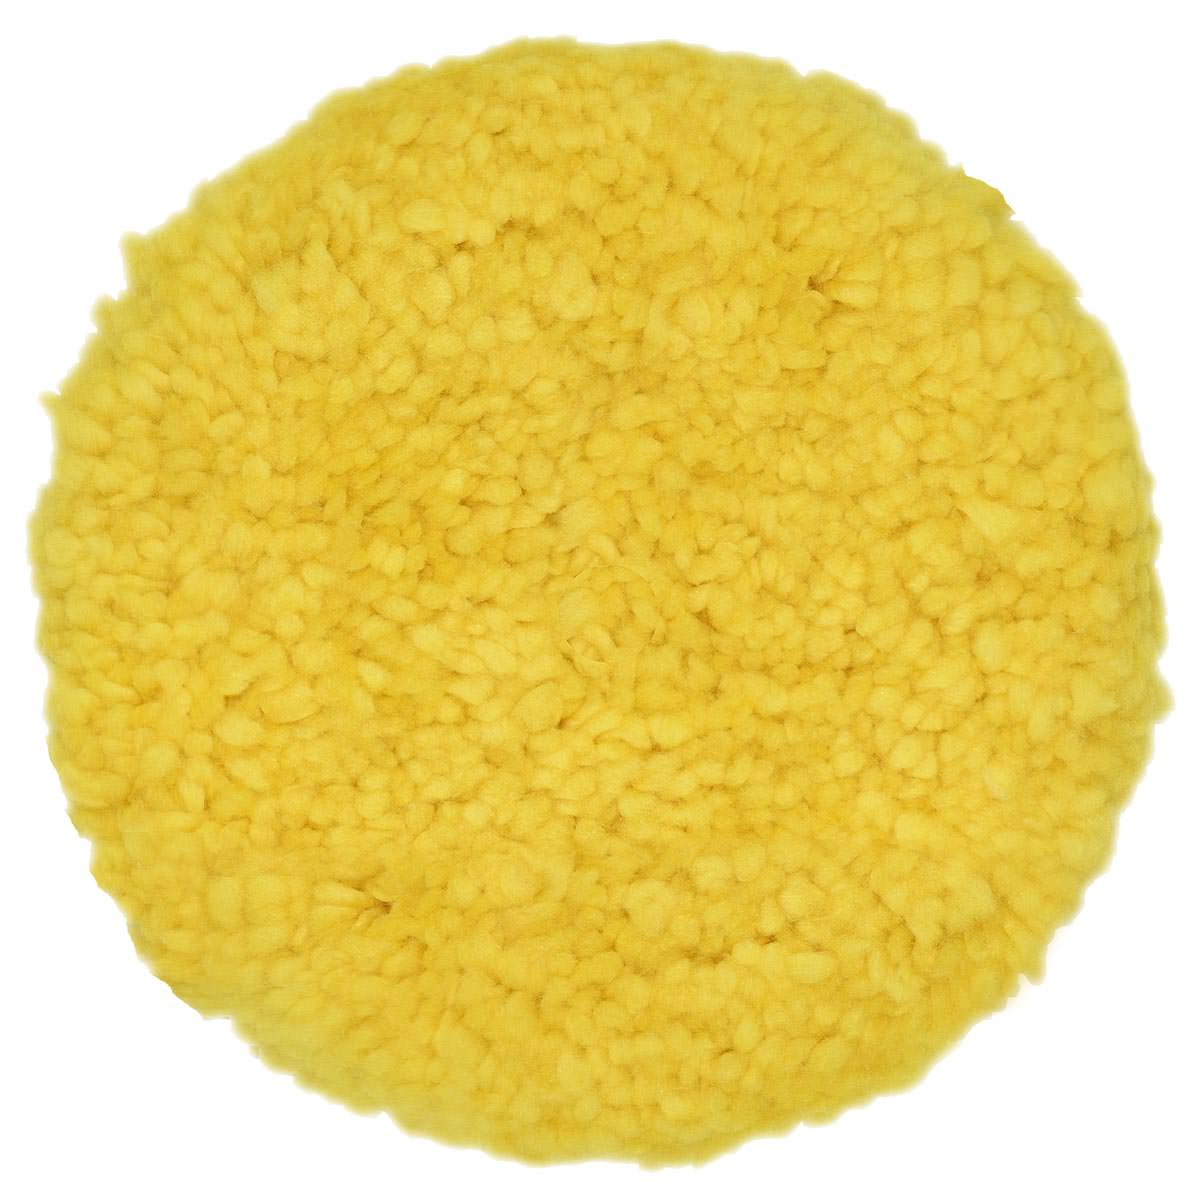 GK Boina de Lã Amarela Dupla Face 8 Polegadas